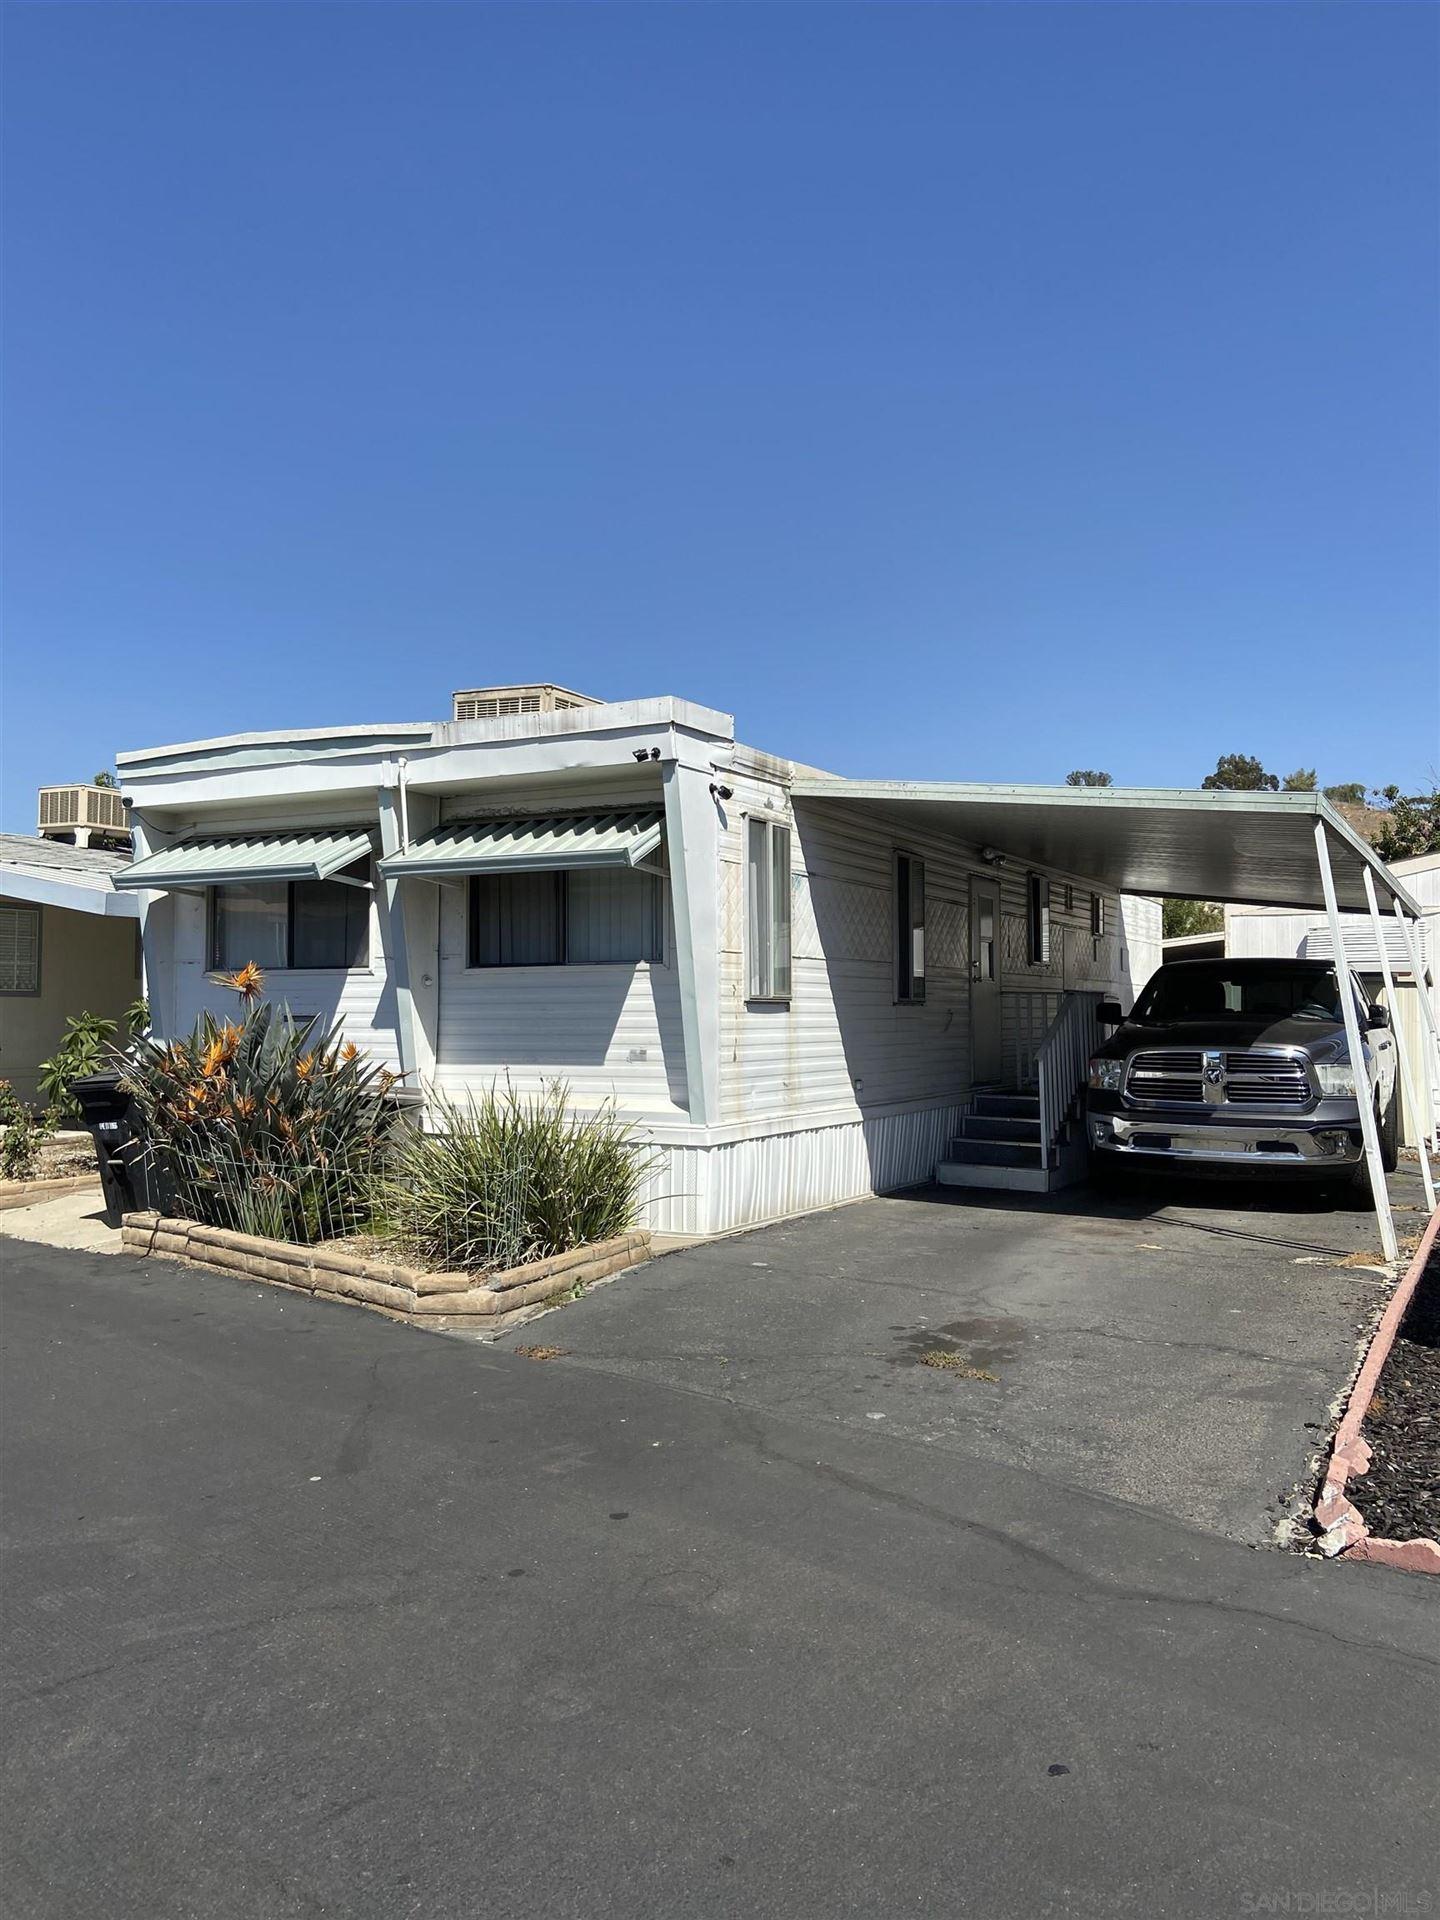 Photo of 351 E Bradley Ave #81, El Cajon, CA 92021 (MLS # 210029376)